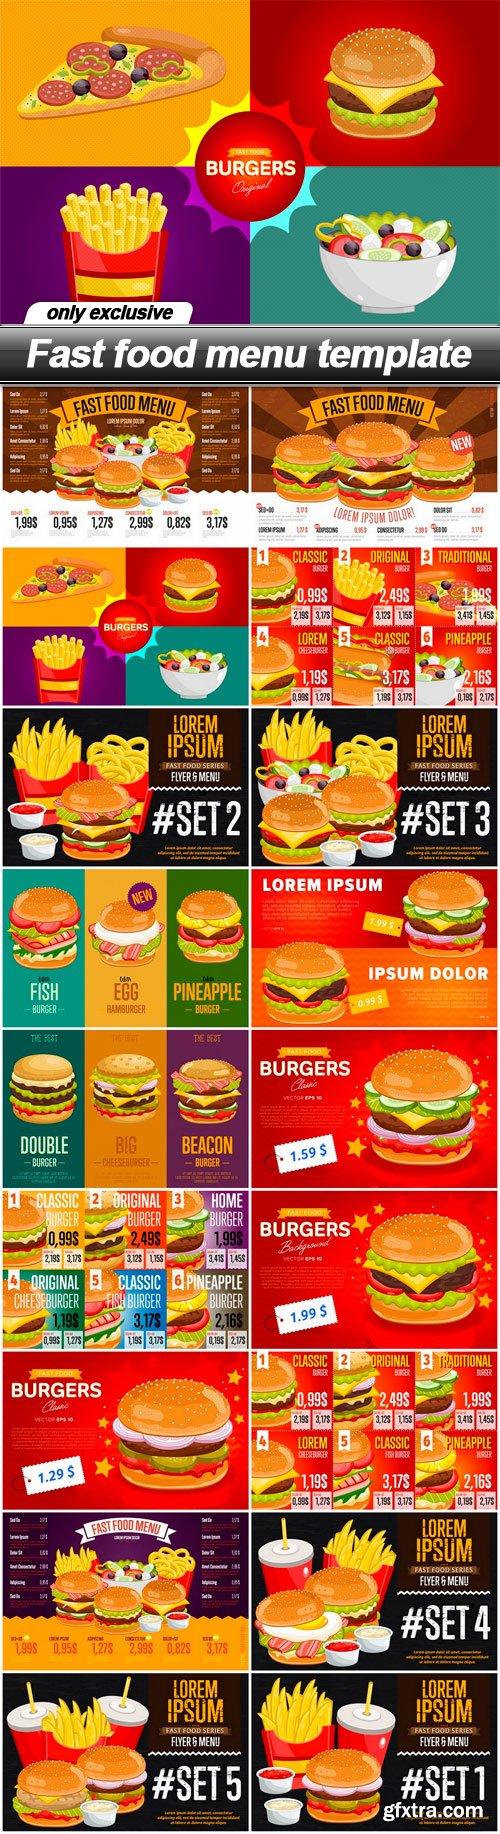 Fast food menu template - 18 EPS